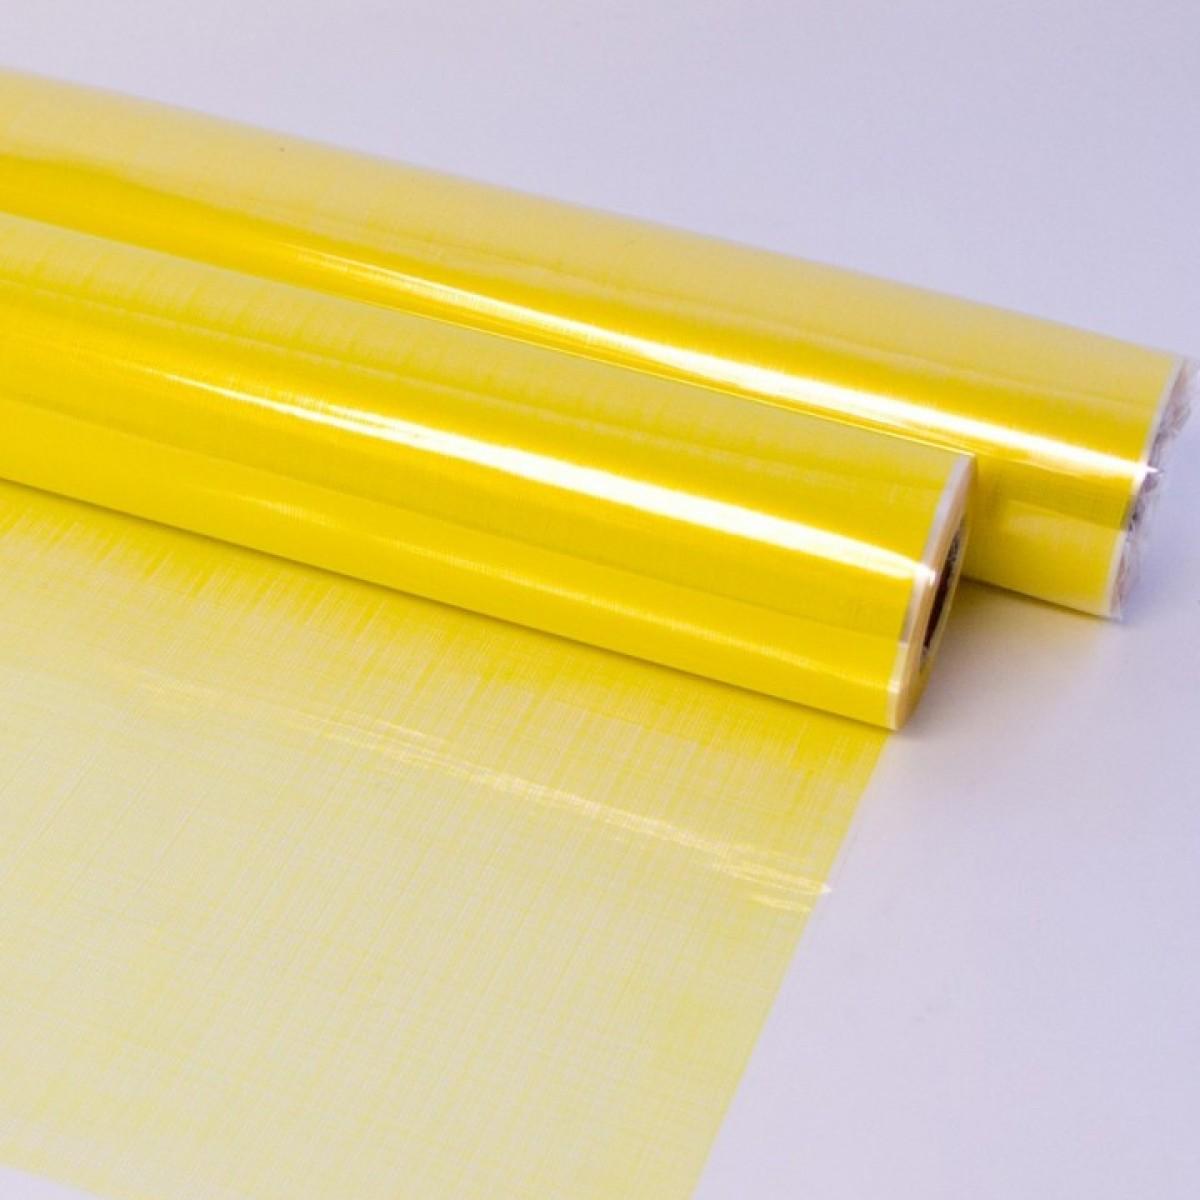 Hessian Yellow 80cmx25m 50mic Film - 1 Roll